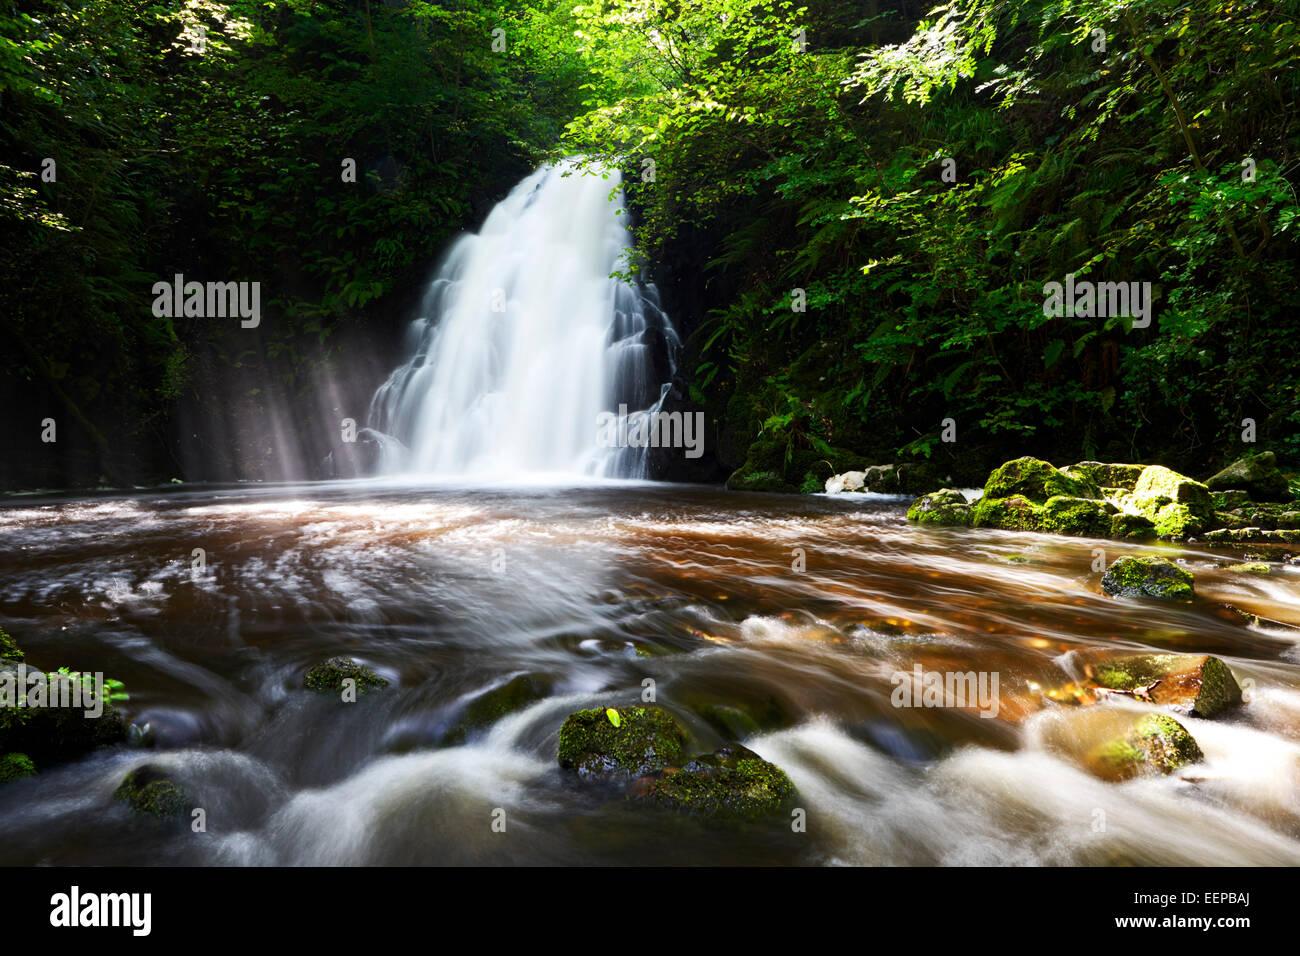 Glenoe Wasserfall in County Antrim Irland Stockbild